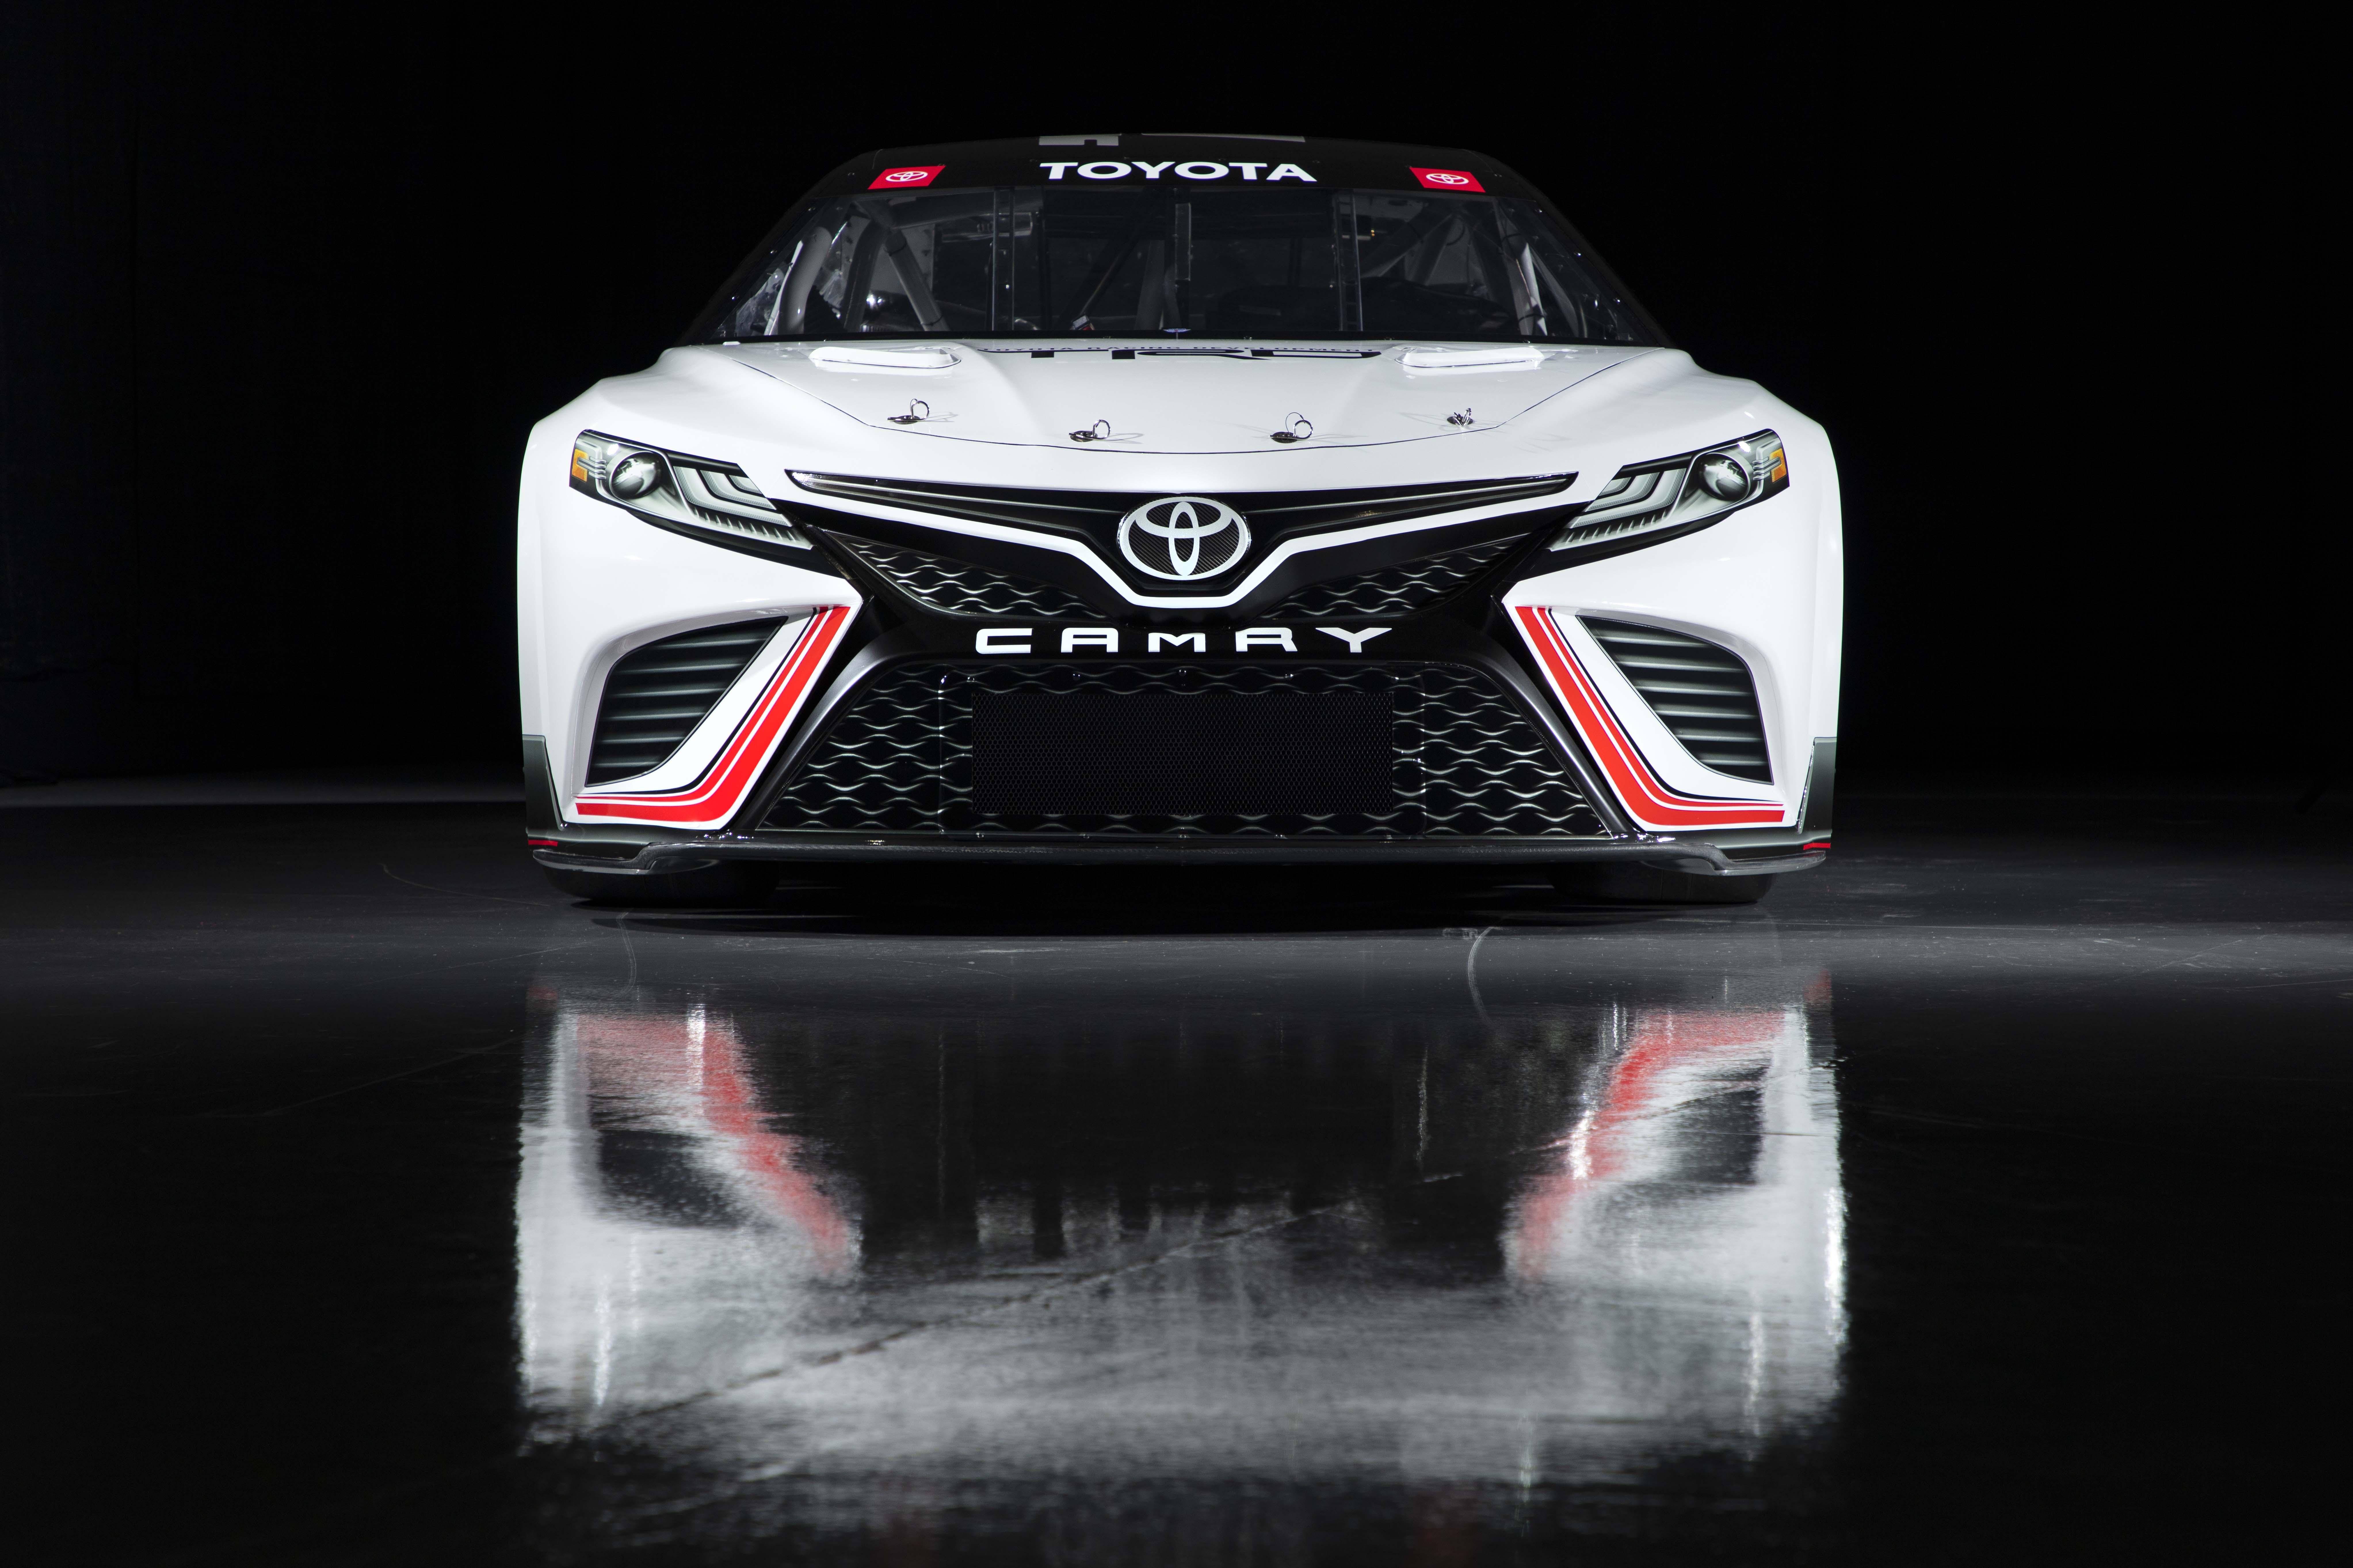 2022 Toyota Camry - NASCAR Next Gen Car - Front Photo